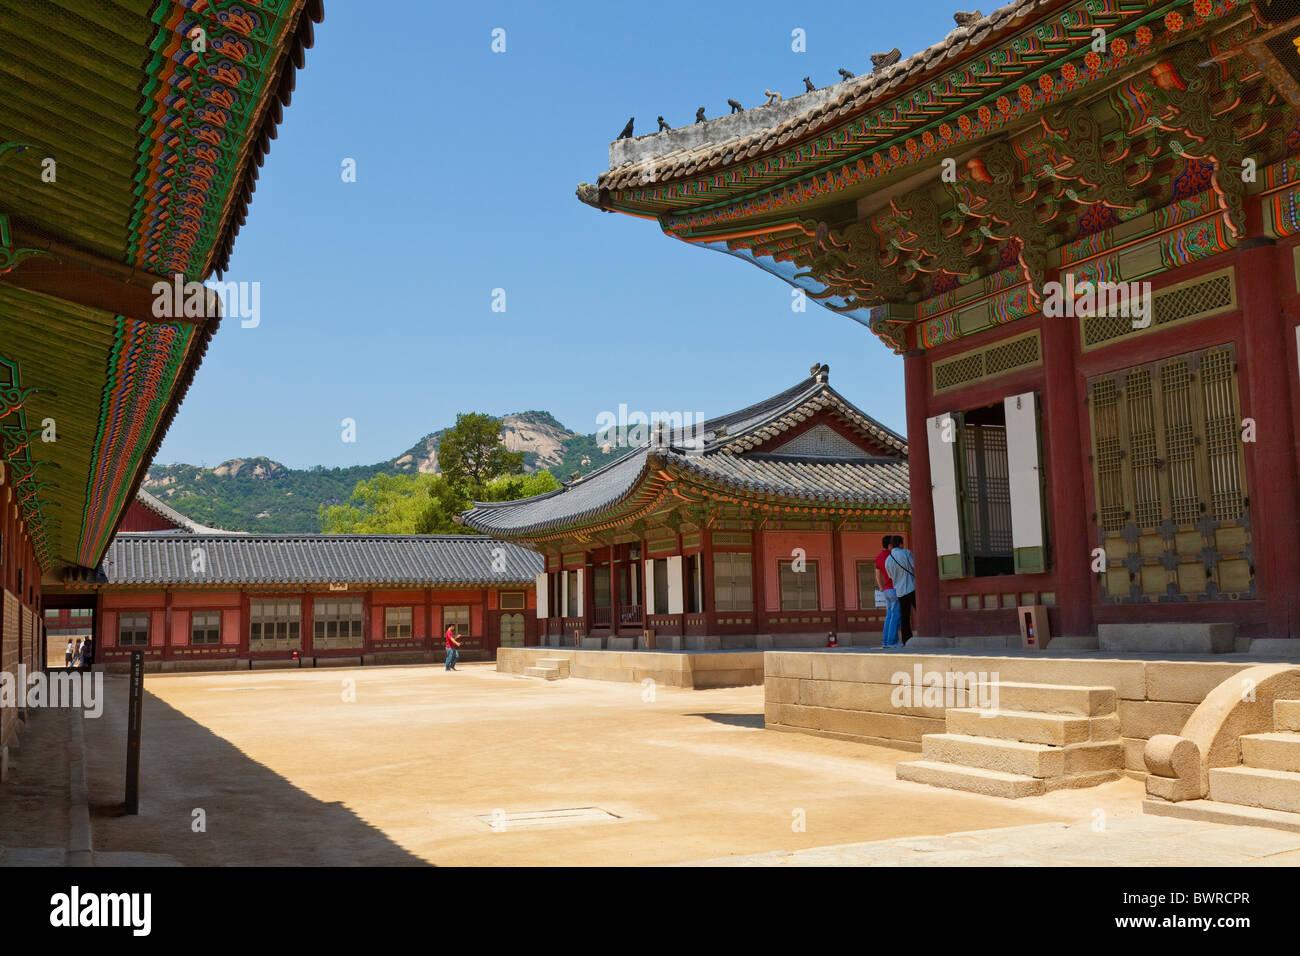 Gyeongbokgung Palace Seoul South Korea. JMH3905 - Stock Image